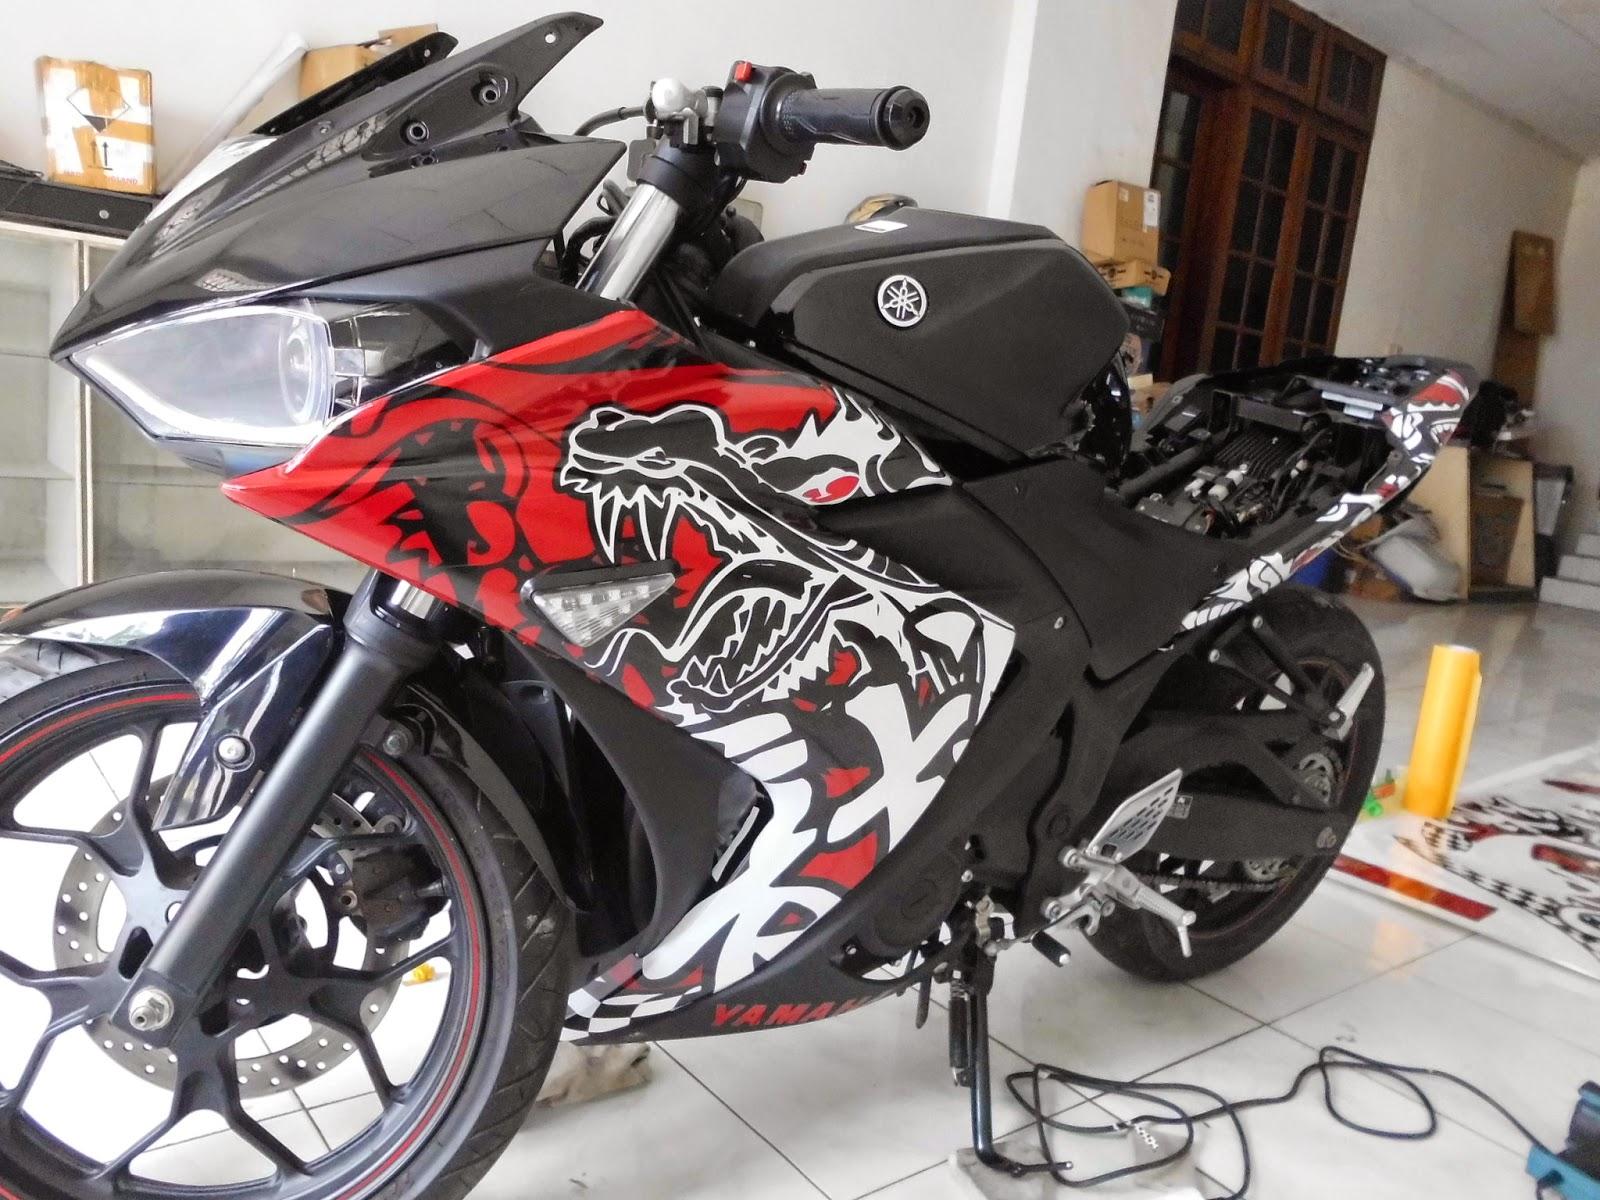 Modifikasi Motor Yamaha R15 Striping Stiker Keren Sukaon